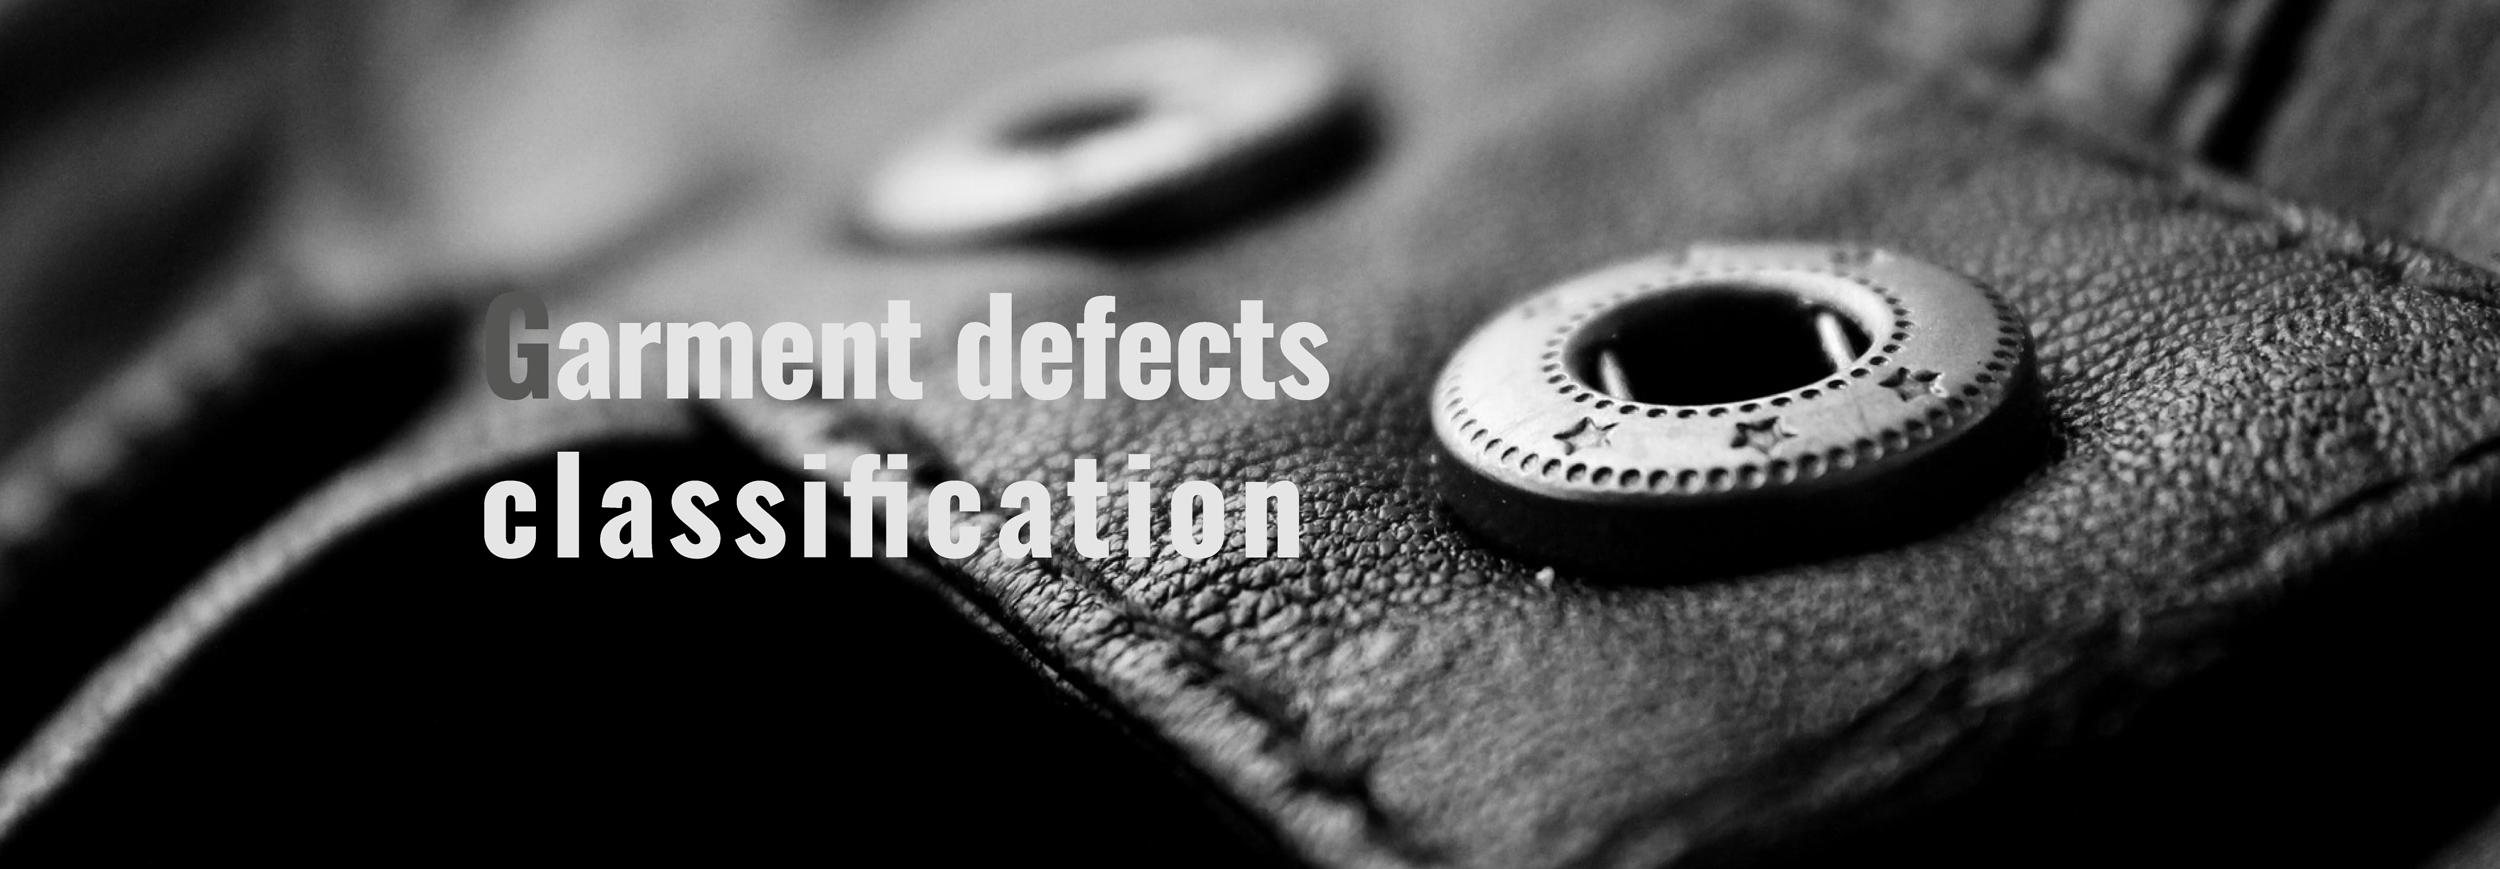 Garment defects classification